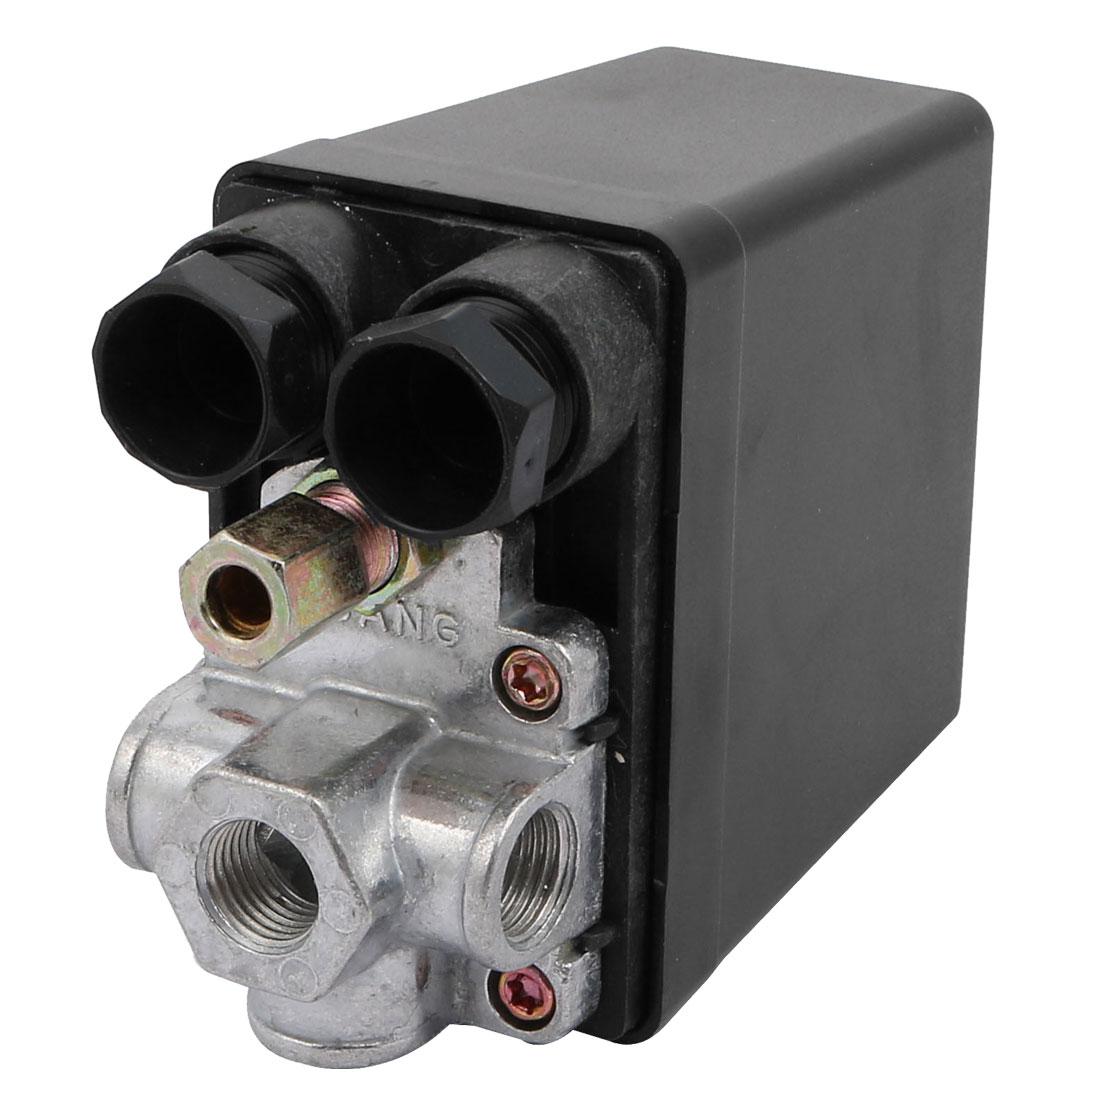 240V 15A 0.8Mpa 4 Ports Air Compressor Pressure Bar Control Switch